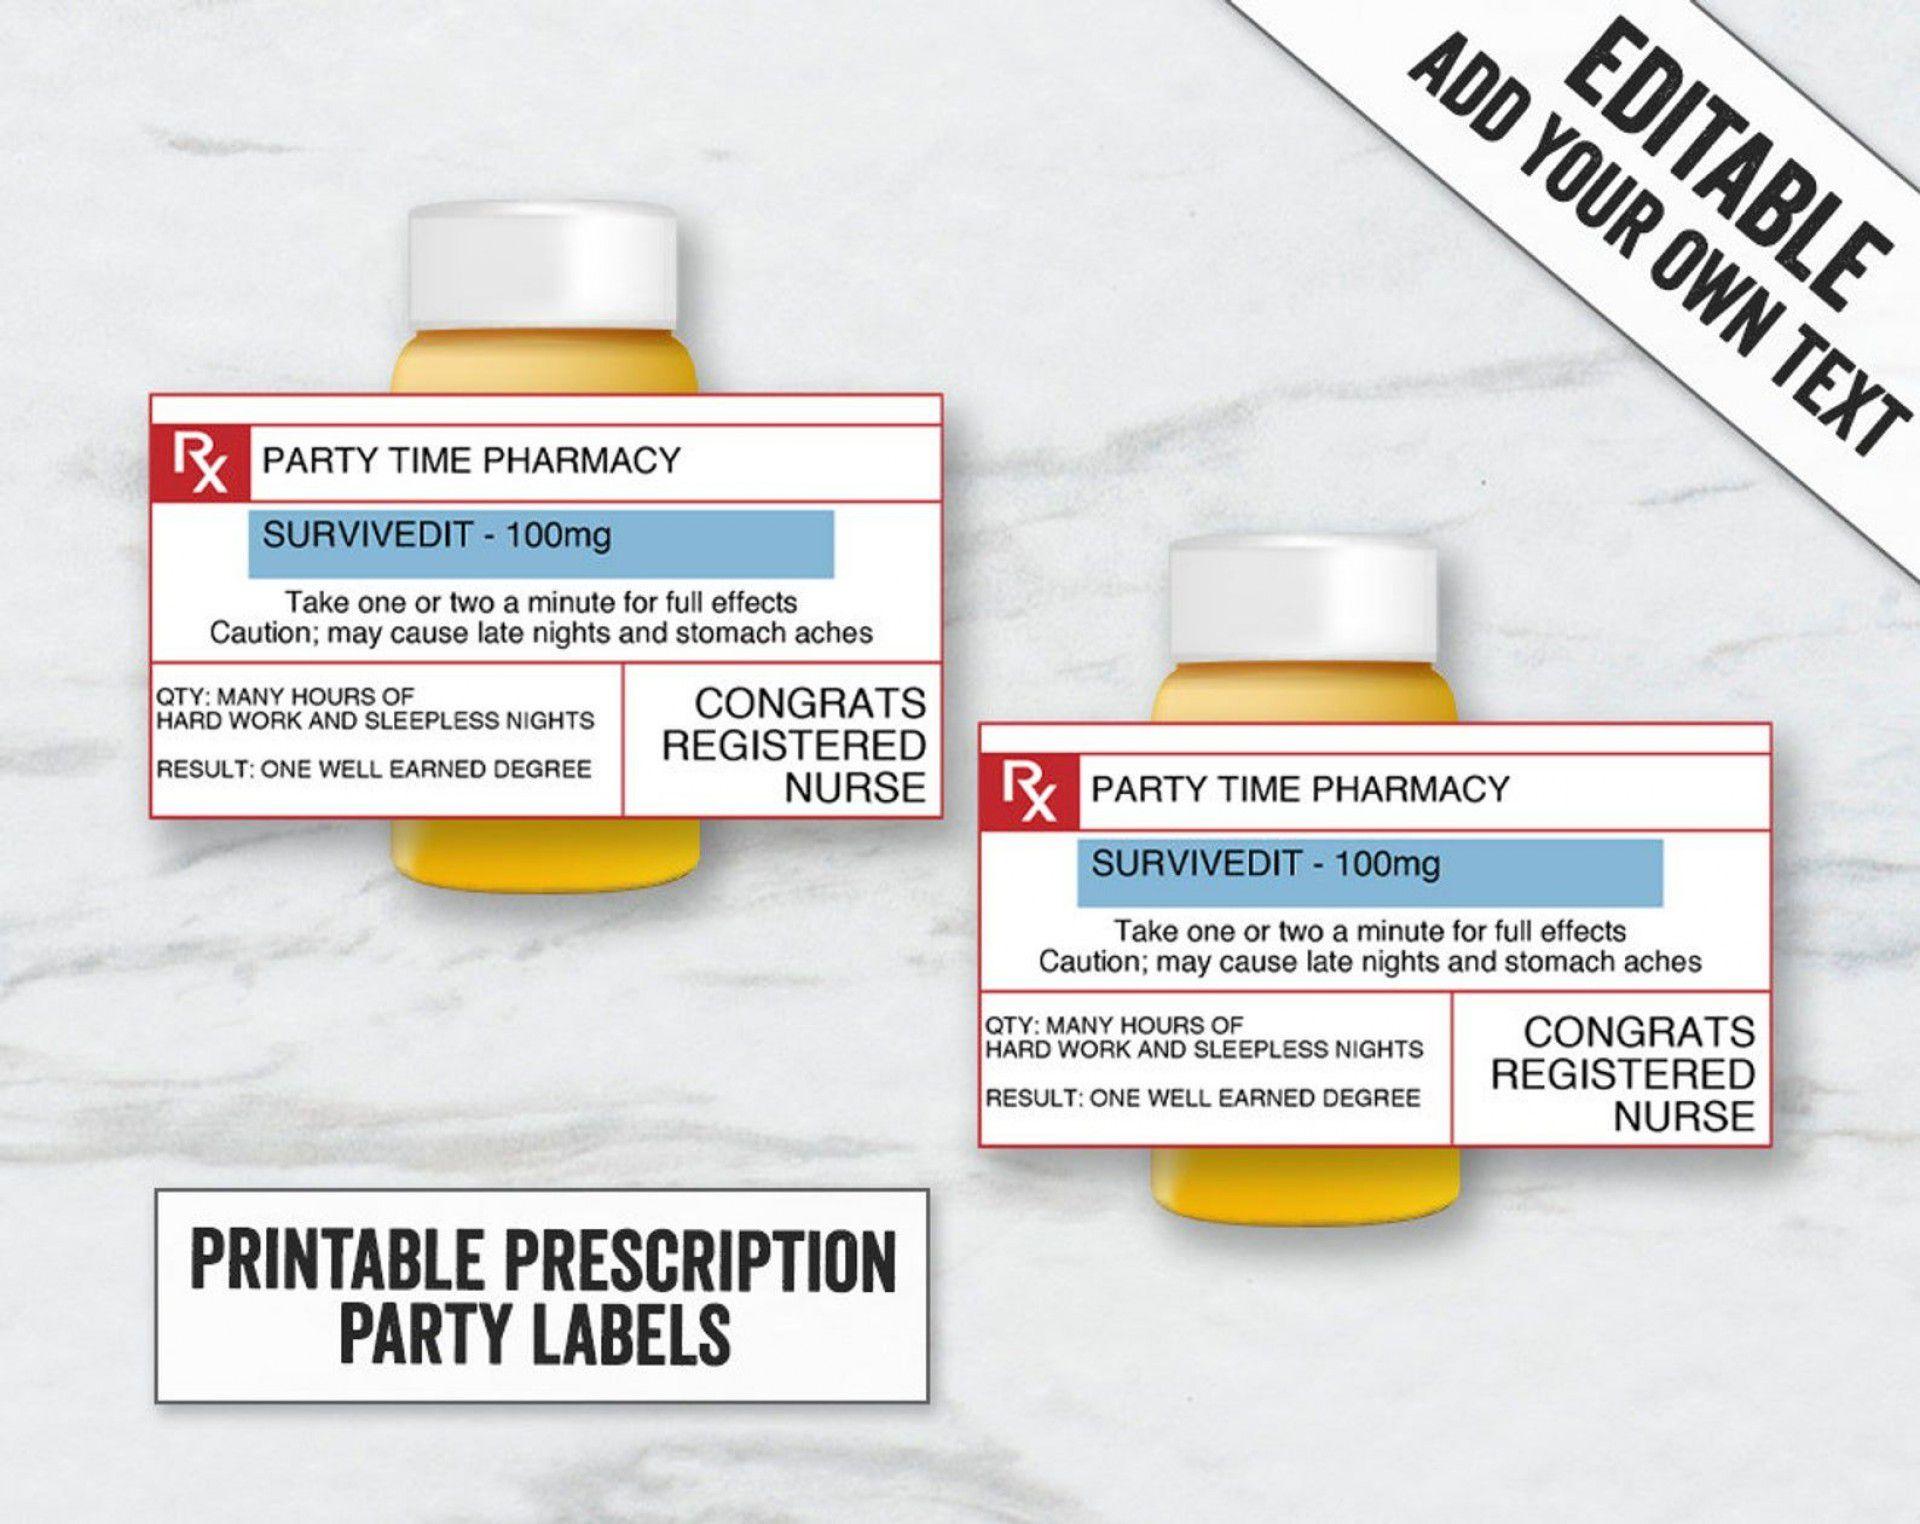 001 Shocking Fake Prescription Bottle Label Template Design Full